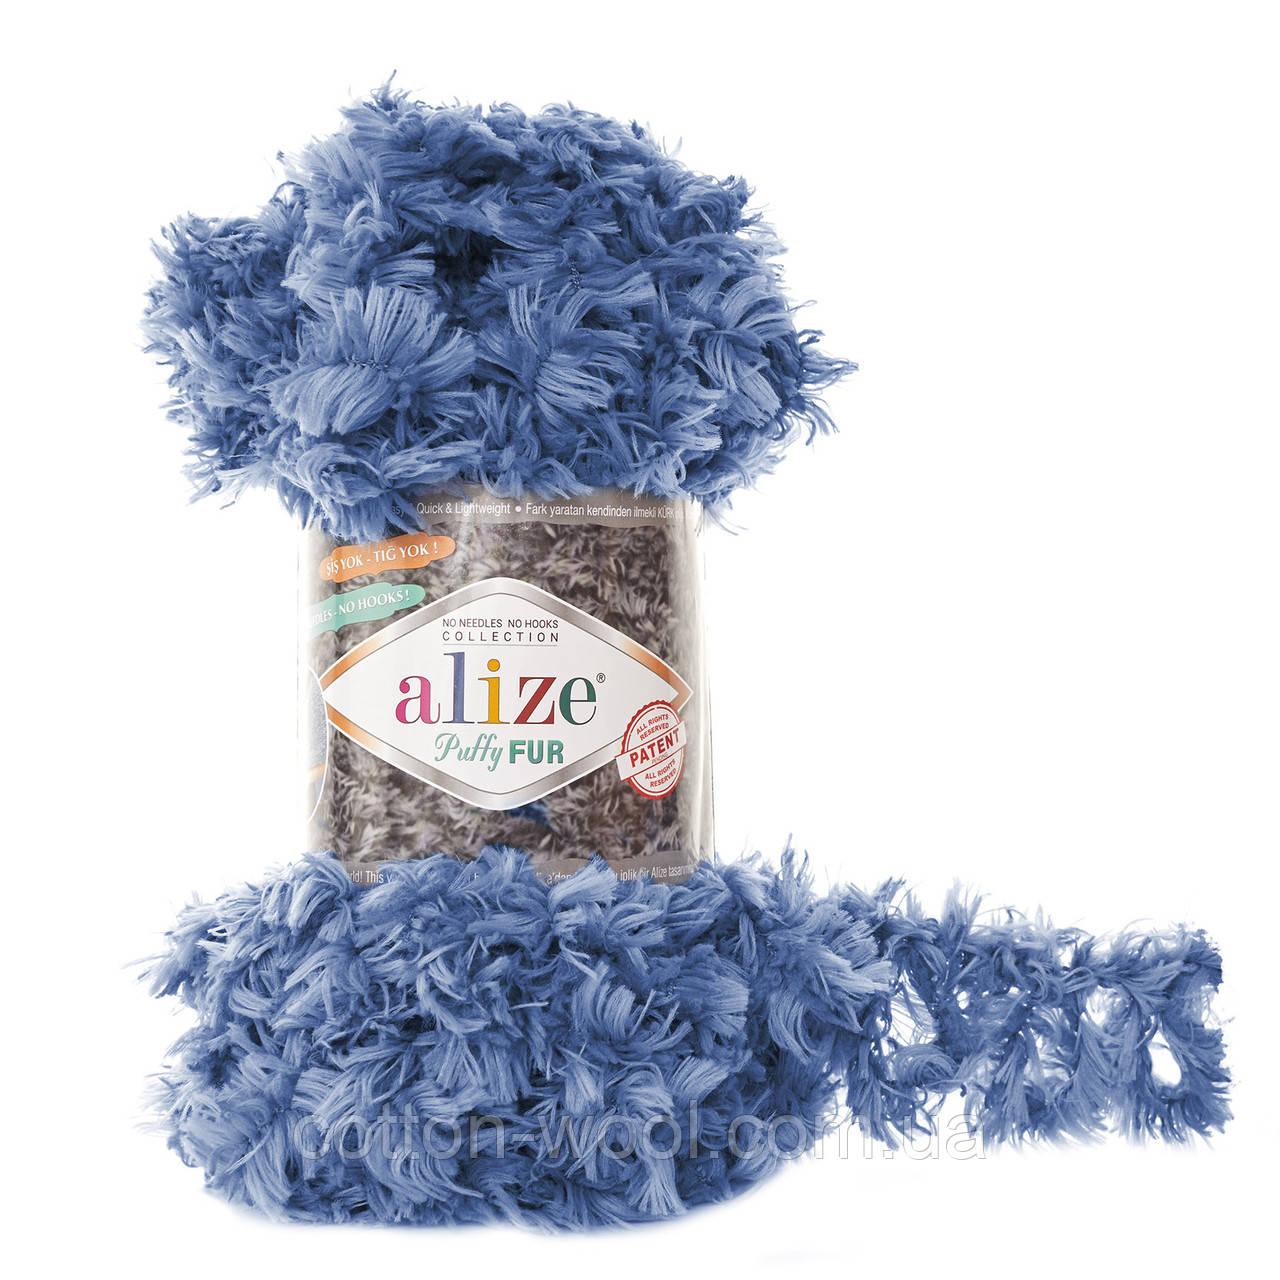 Puffy Fur (Паффі Фур) (100% - поліестер) 6116